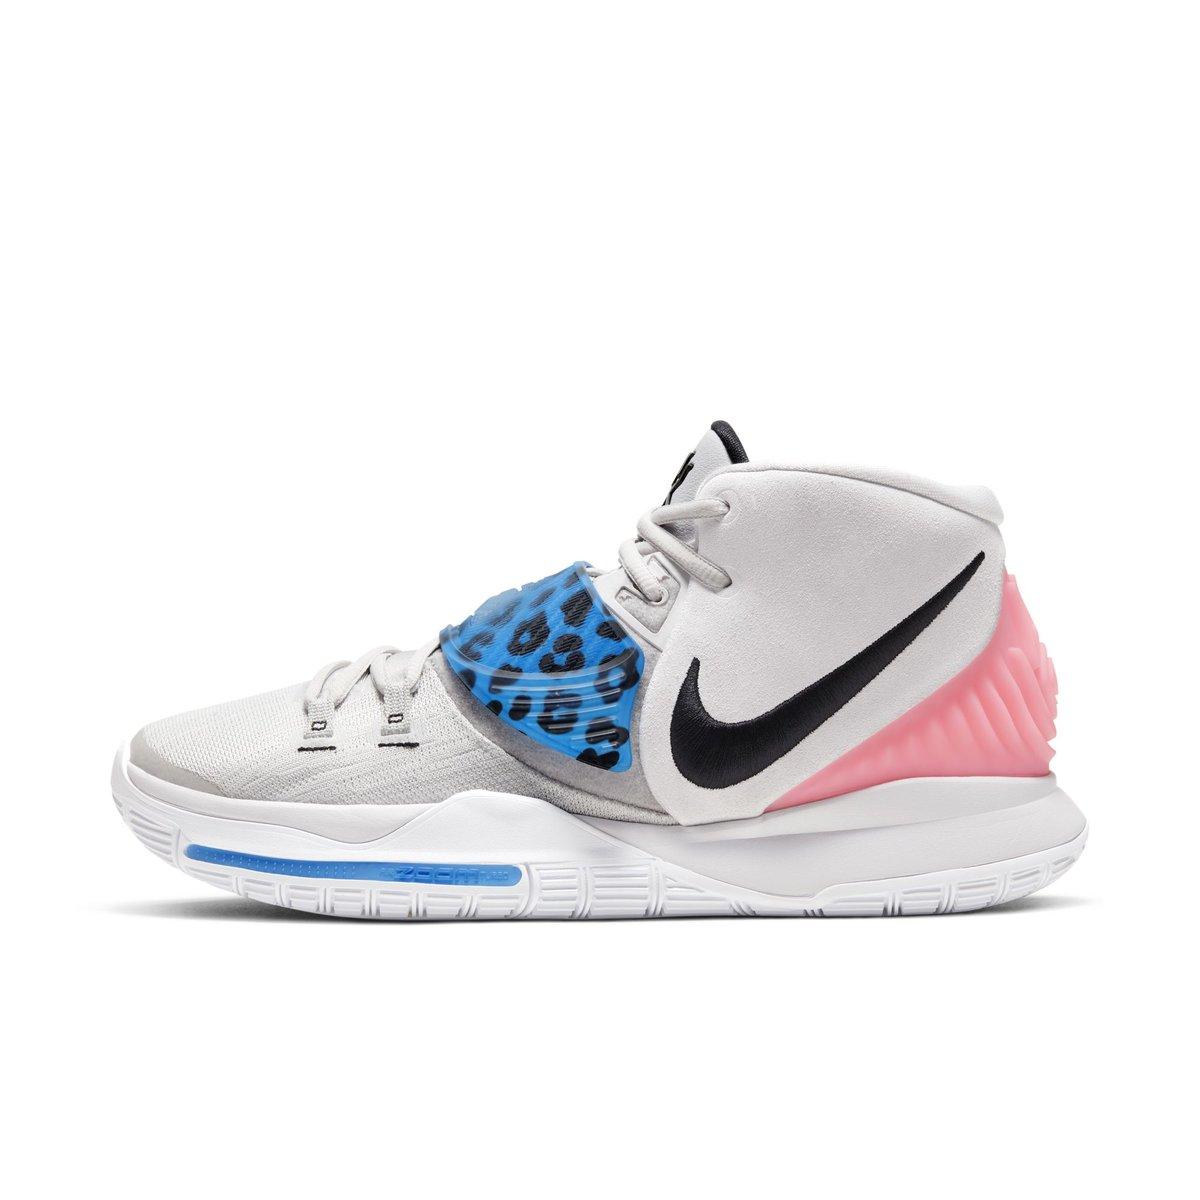 Kyrie 6,Nike, 鸳鸯鞋提!清新糖果色调 Kyrie 6 官图曝光!